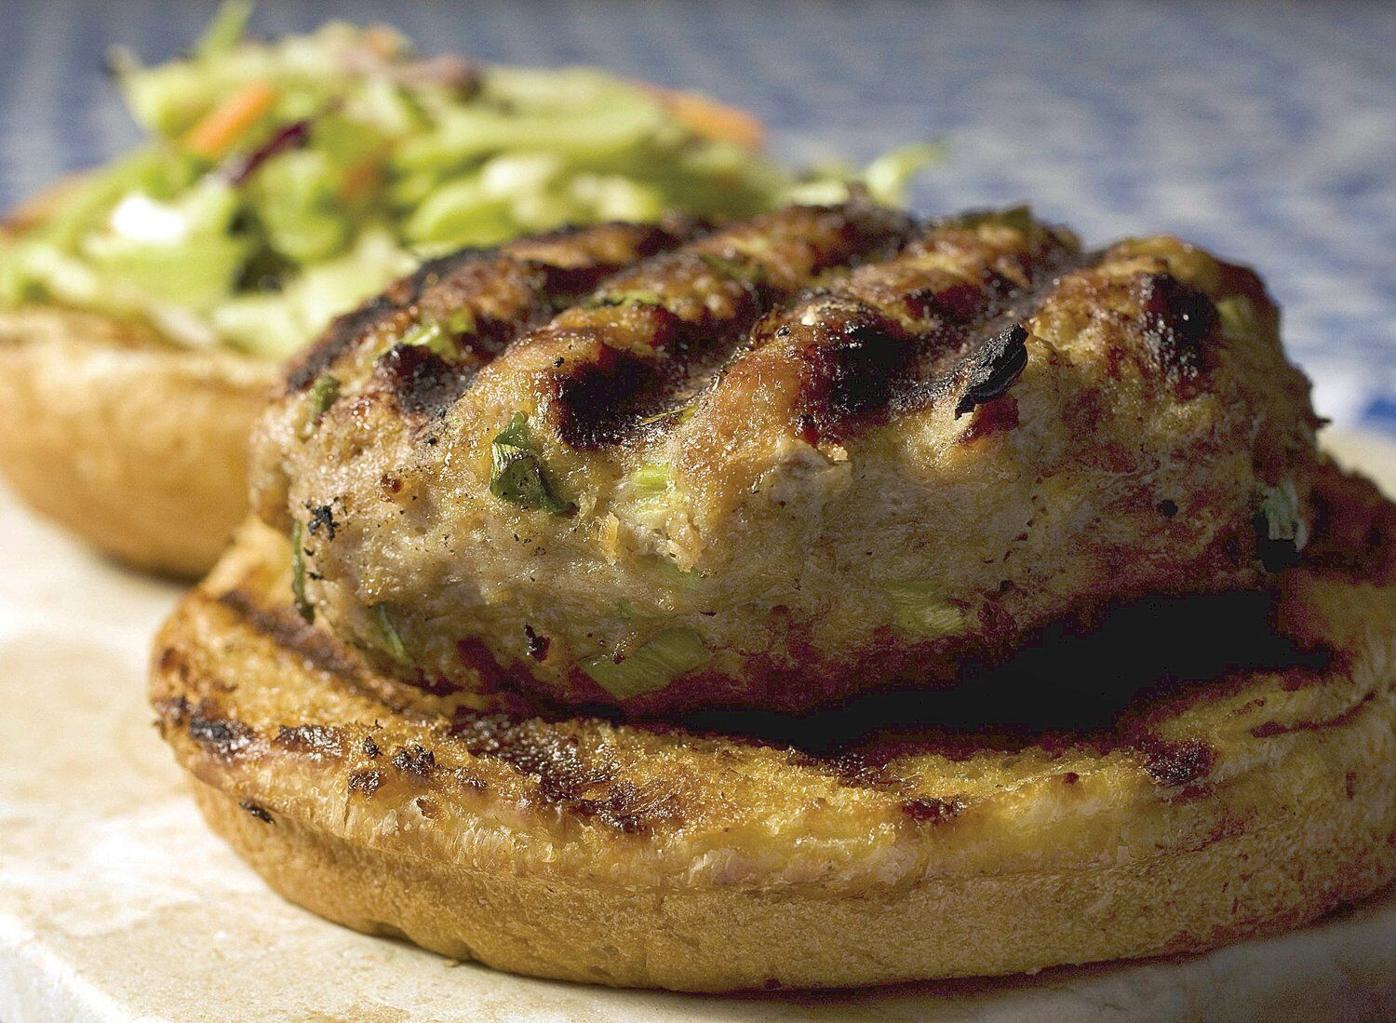 Beef-less burgers big on flavor